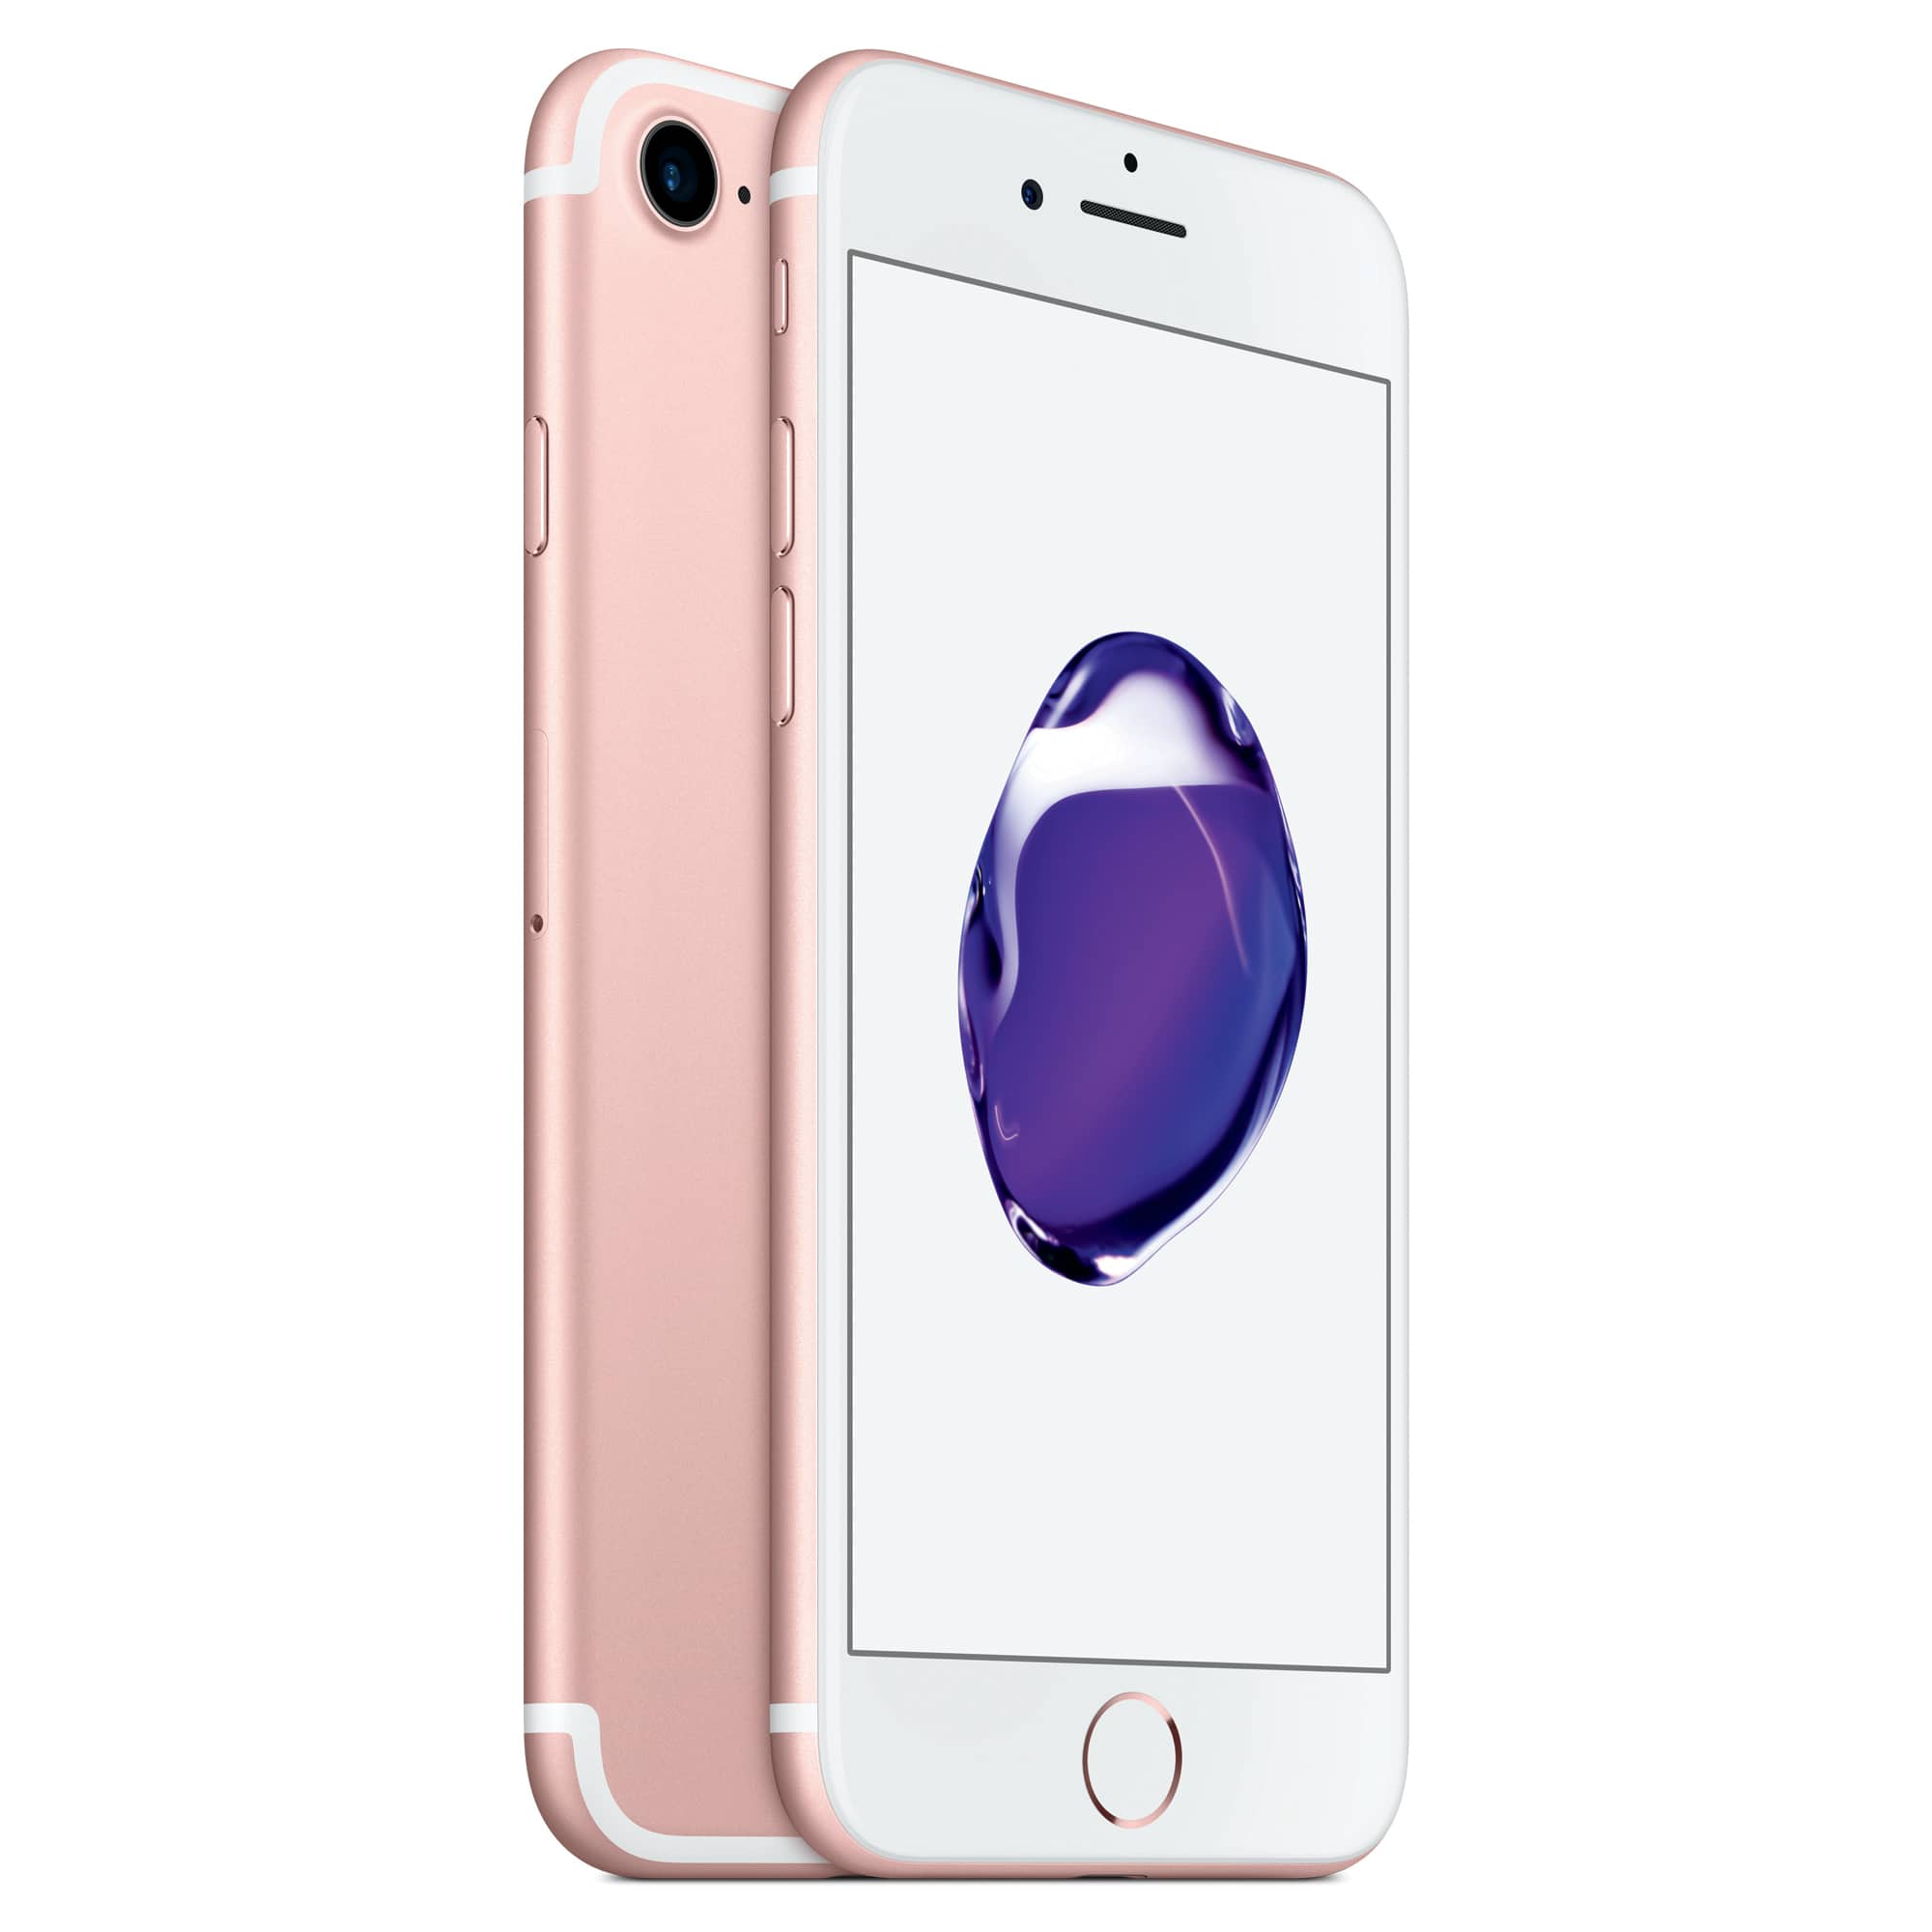 Straight Talk Locked 32GB Apple iPhone 7 Prepaid Phone (Refurbished) - $149 + Free Shipping @ Walmart